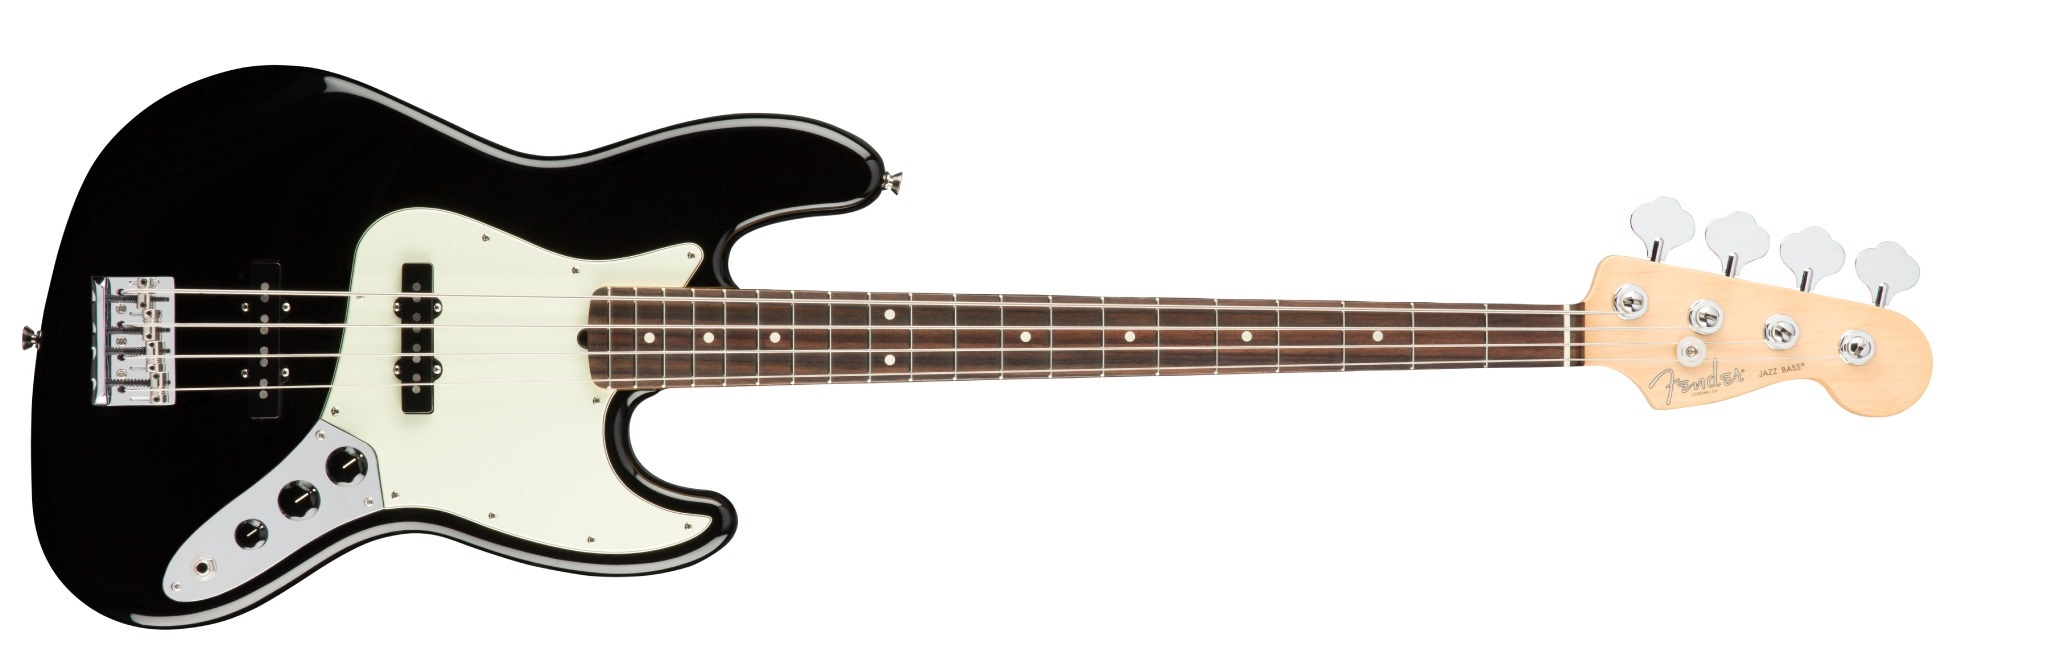 Fender American Professional Jazz Bass RW BK